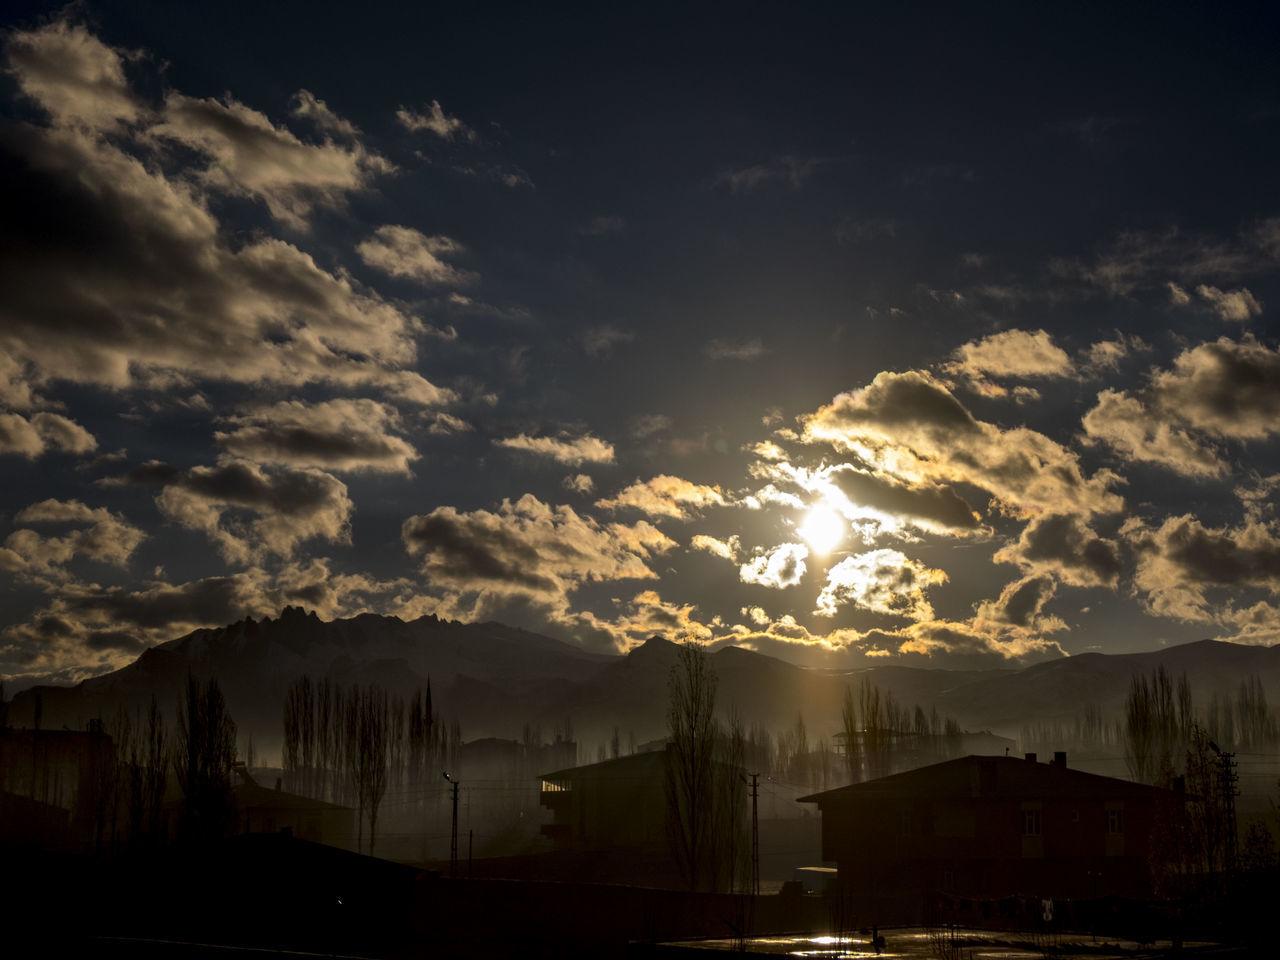 Ağrı Cloud Cloud - Sky Cloudy Doğubayazıt Sky Storm Cloud Strong Clouds Sundown Sunset